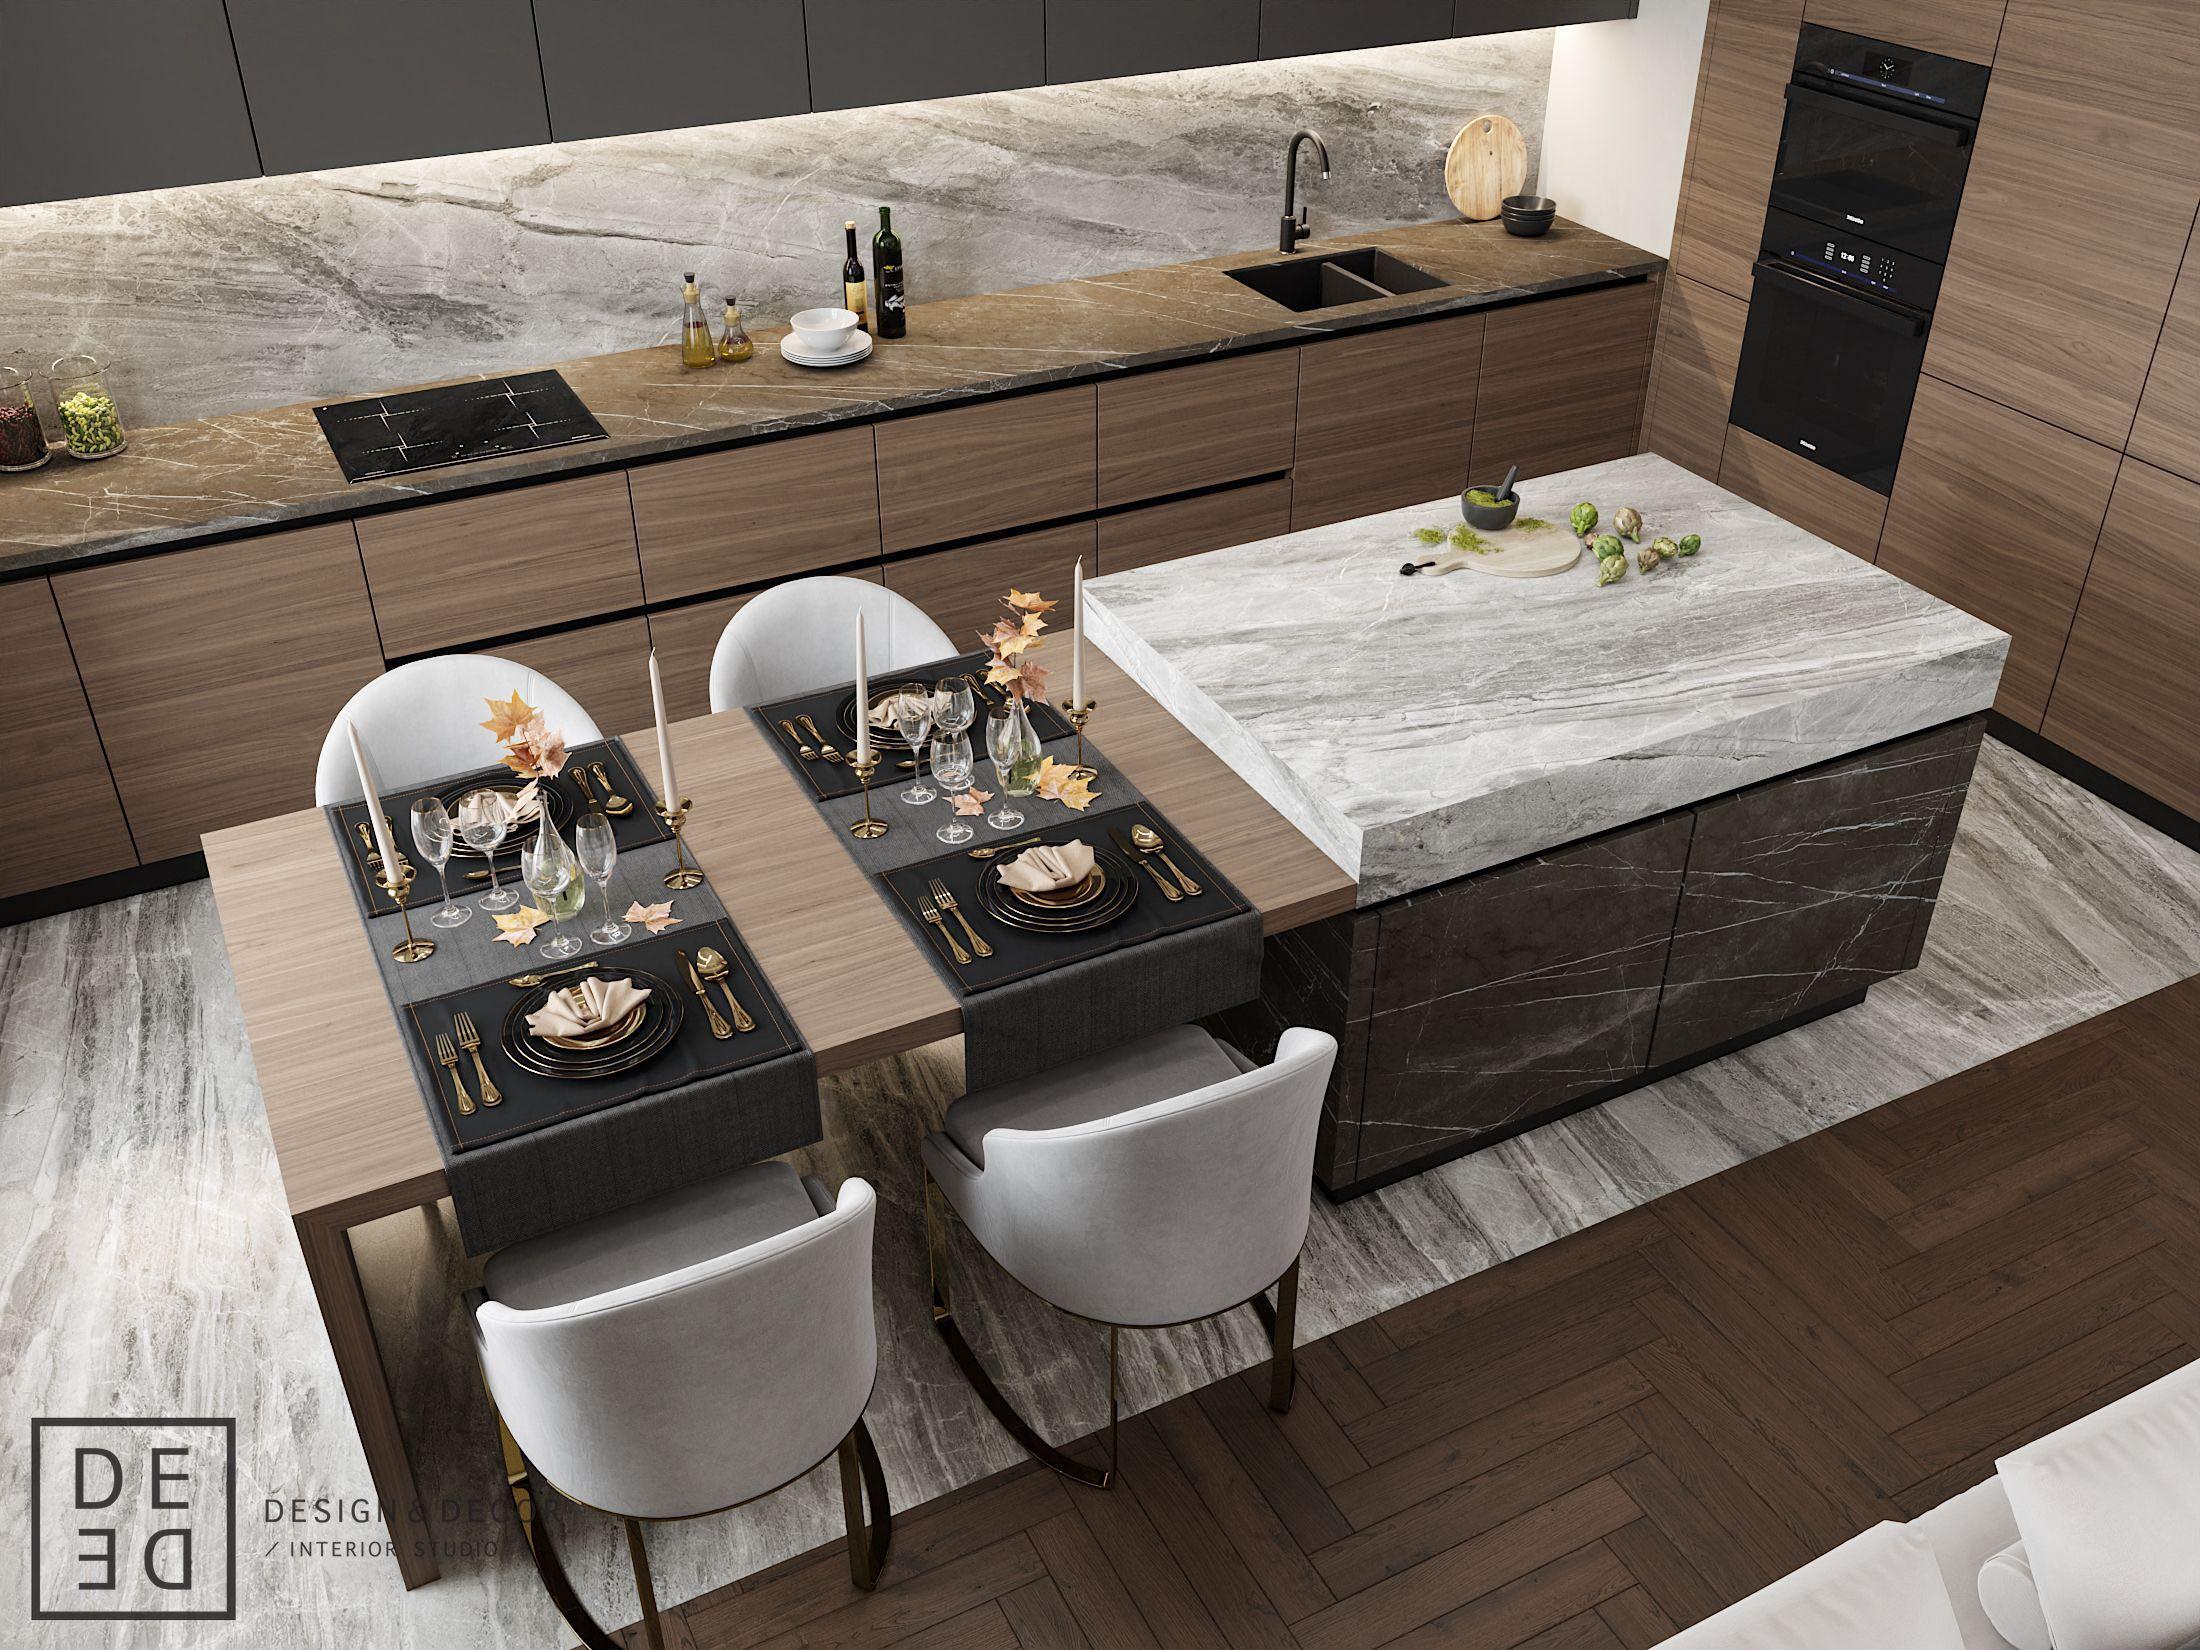 De De Studio On Behance Kitchen Room Design Kitchen Furniture Design Home Decor Kitchen